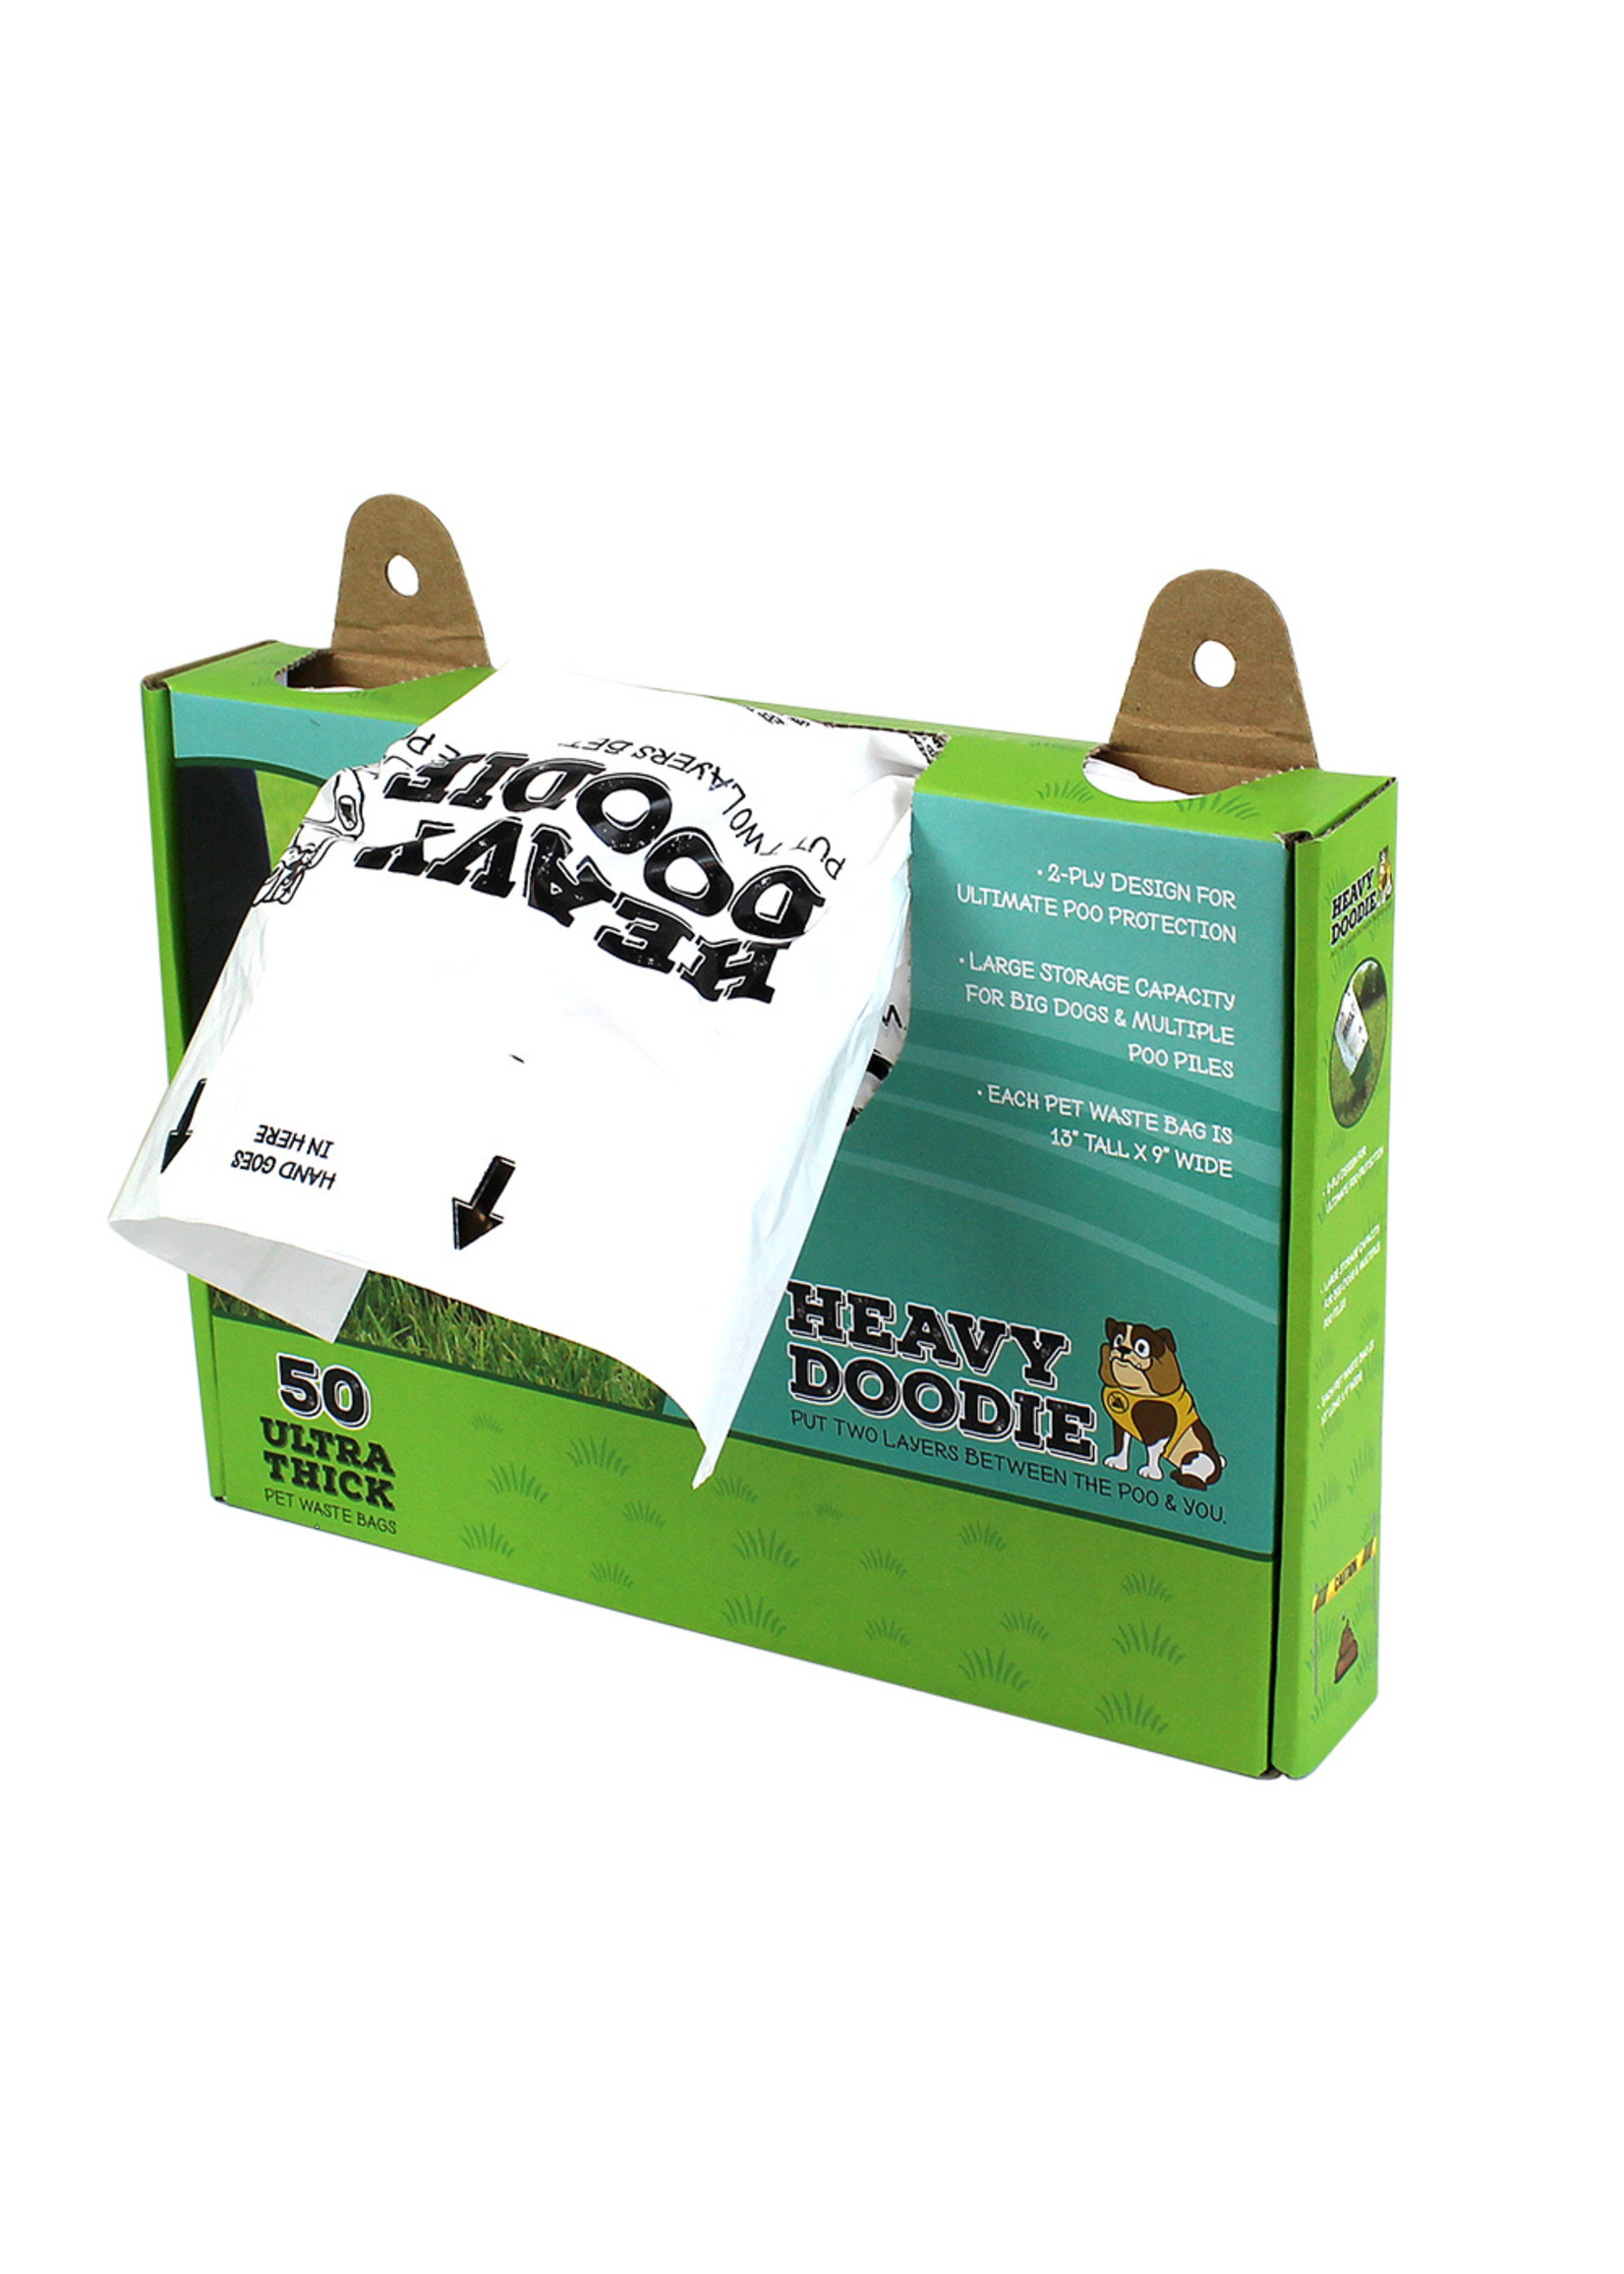 Alcott Heavy Doodie 2 Ply Waste Bag 50 count